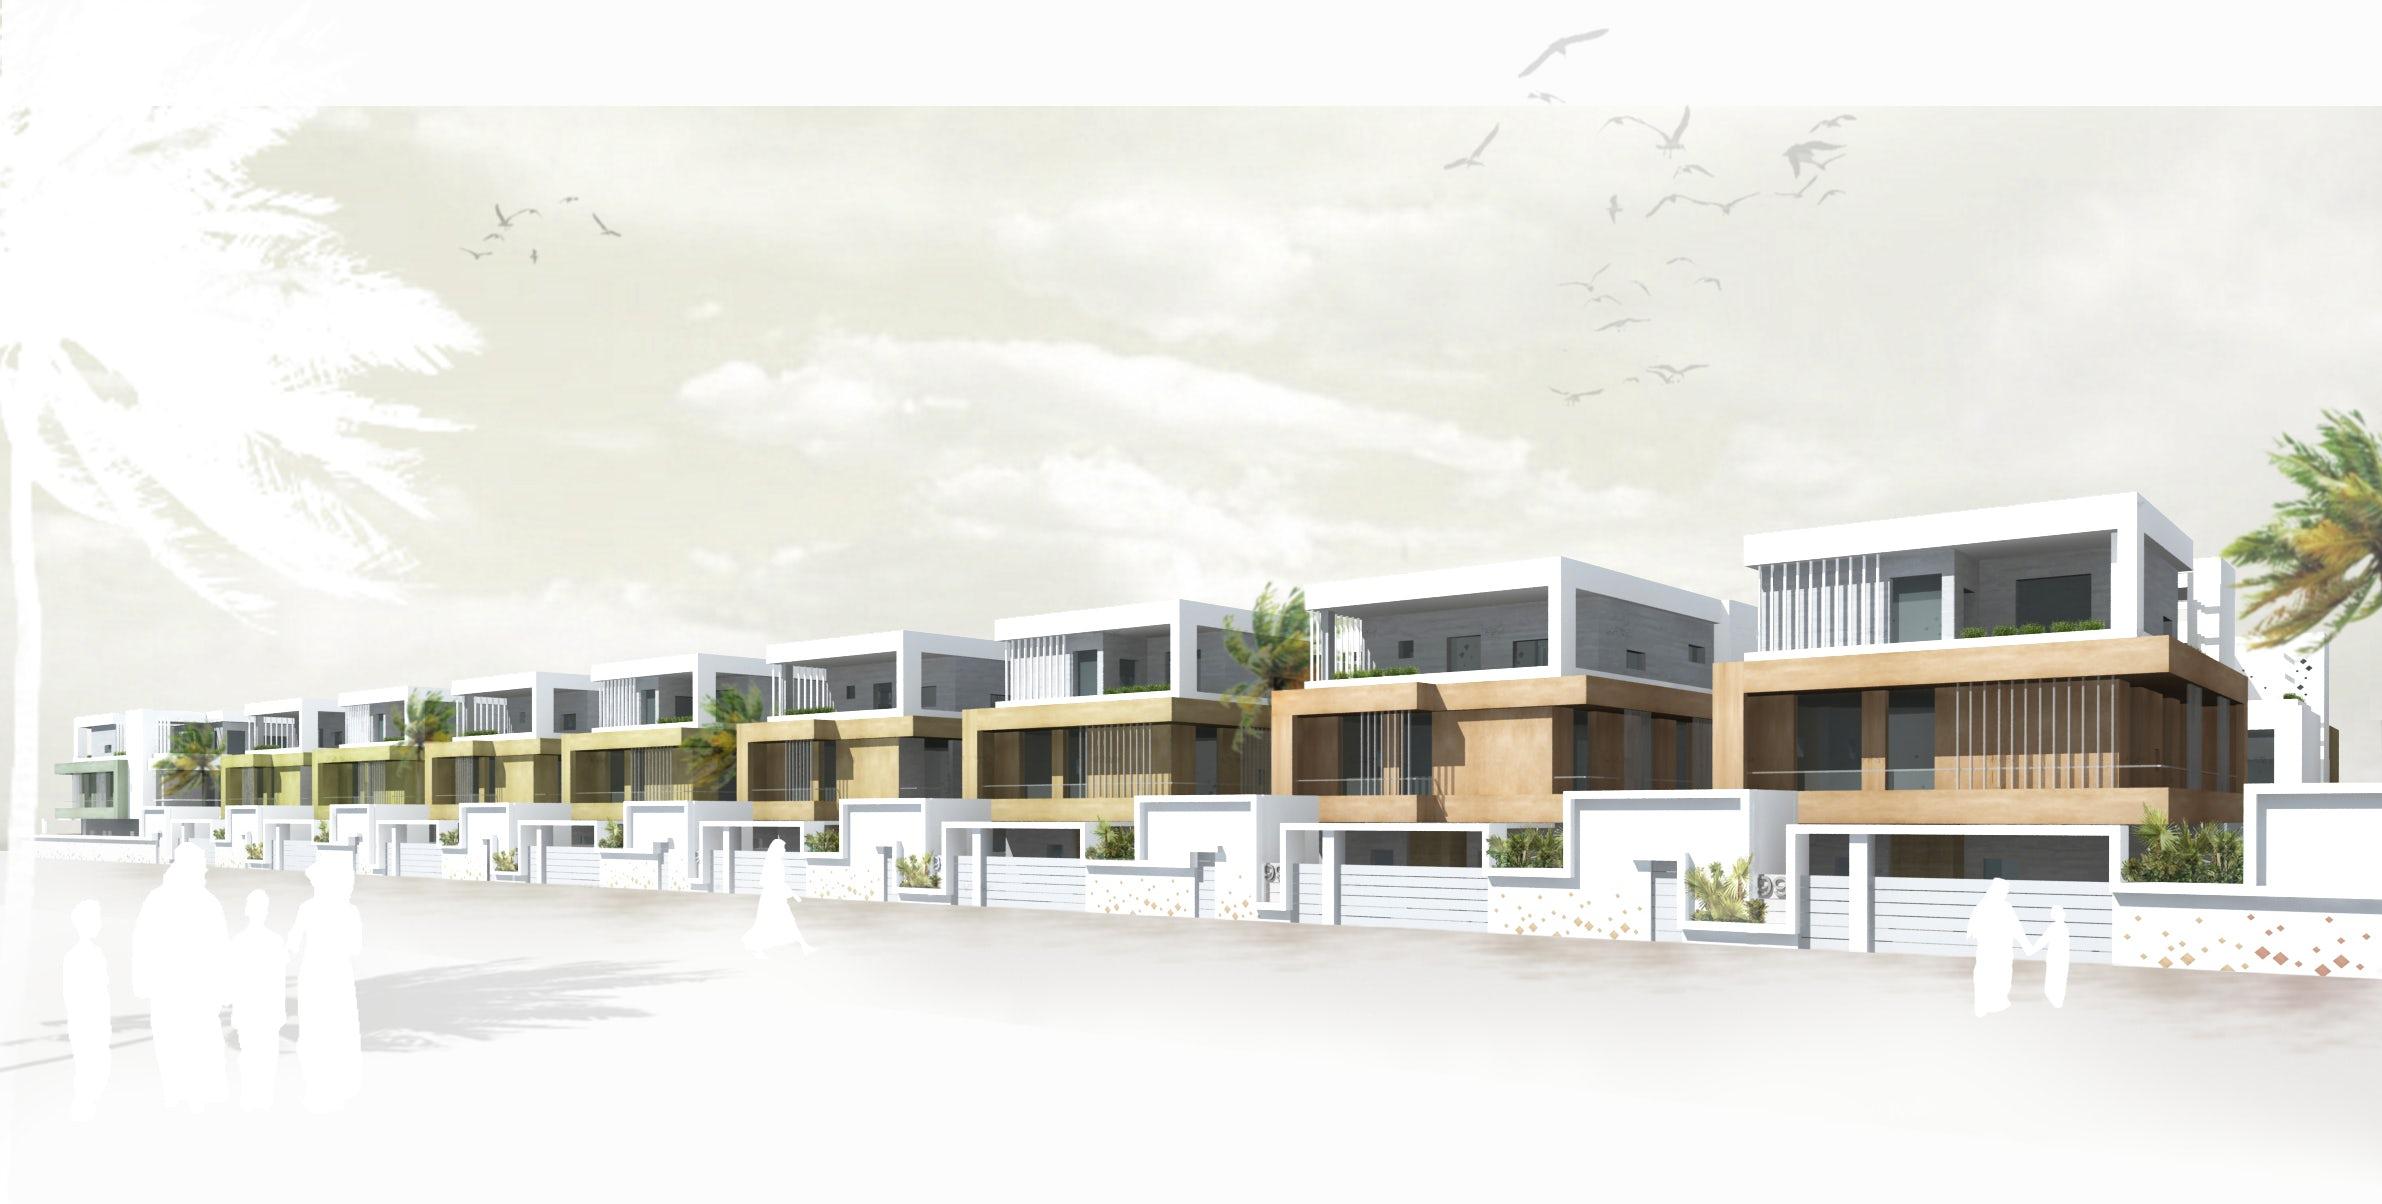 Residential Housing 26 units in Obhur, Arabia